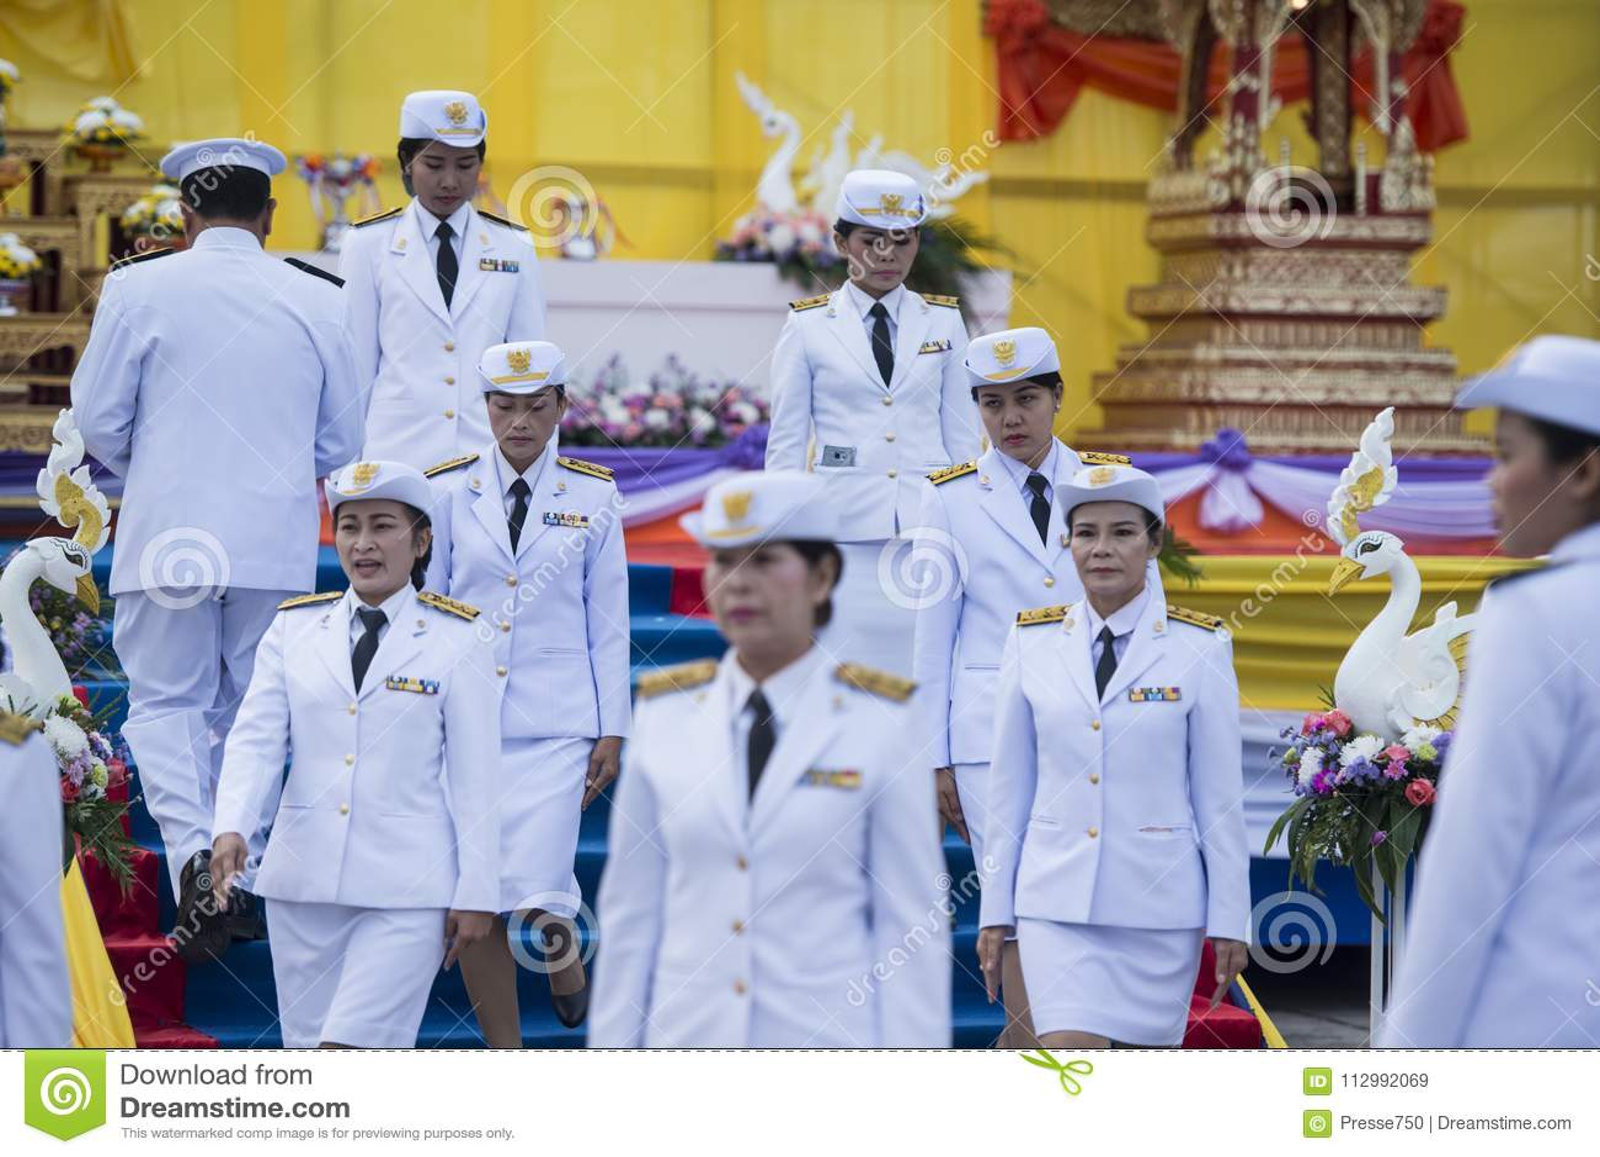 THAILAND BURIRAM SATUEK LONGBOAT RACE ARMY